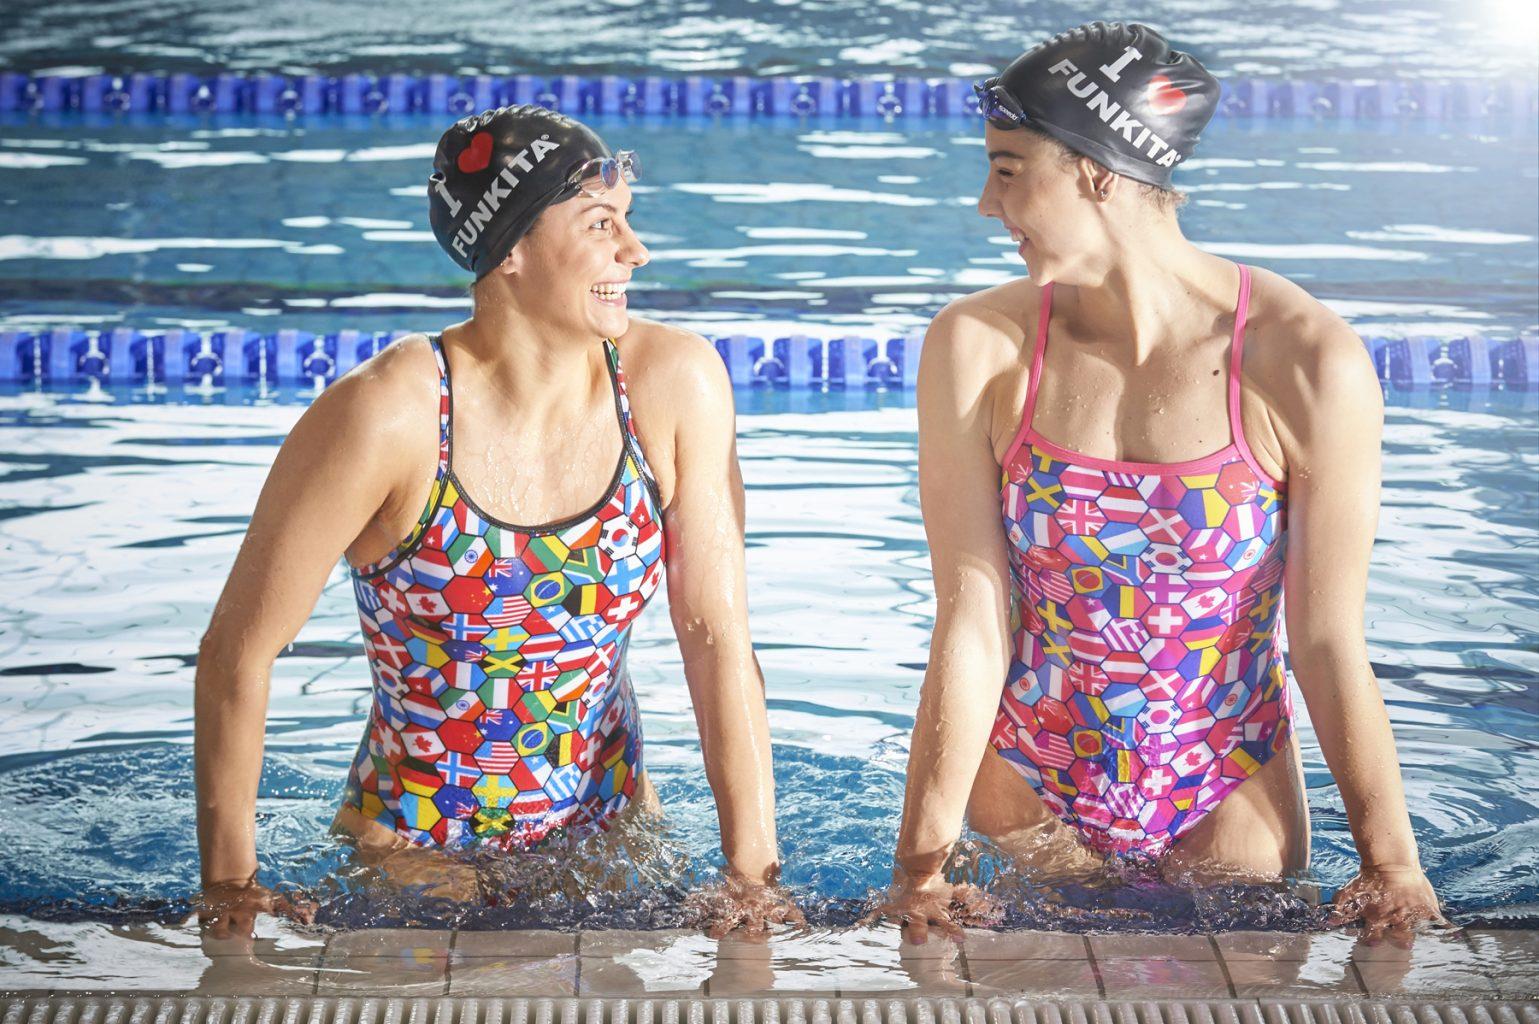 Way Funky swimwear shoot at The National Aquatics Centre, London, UK.